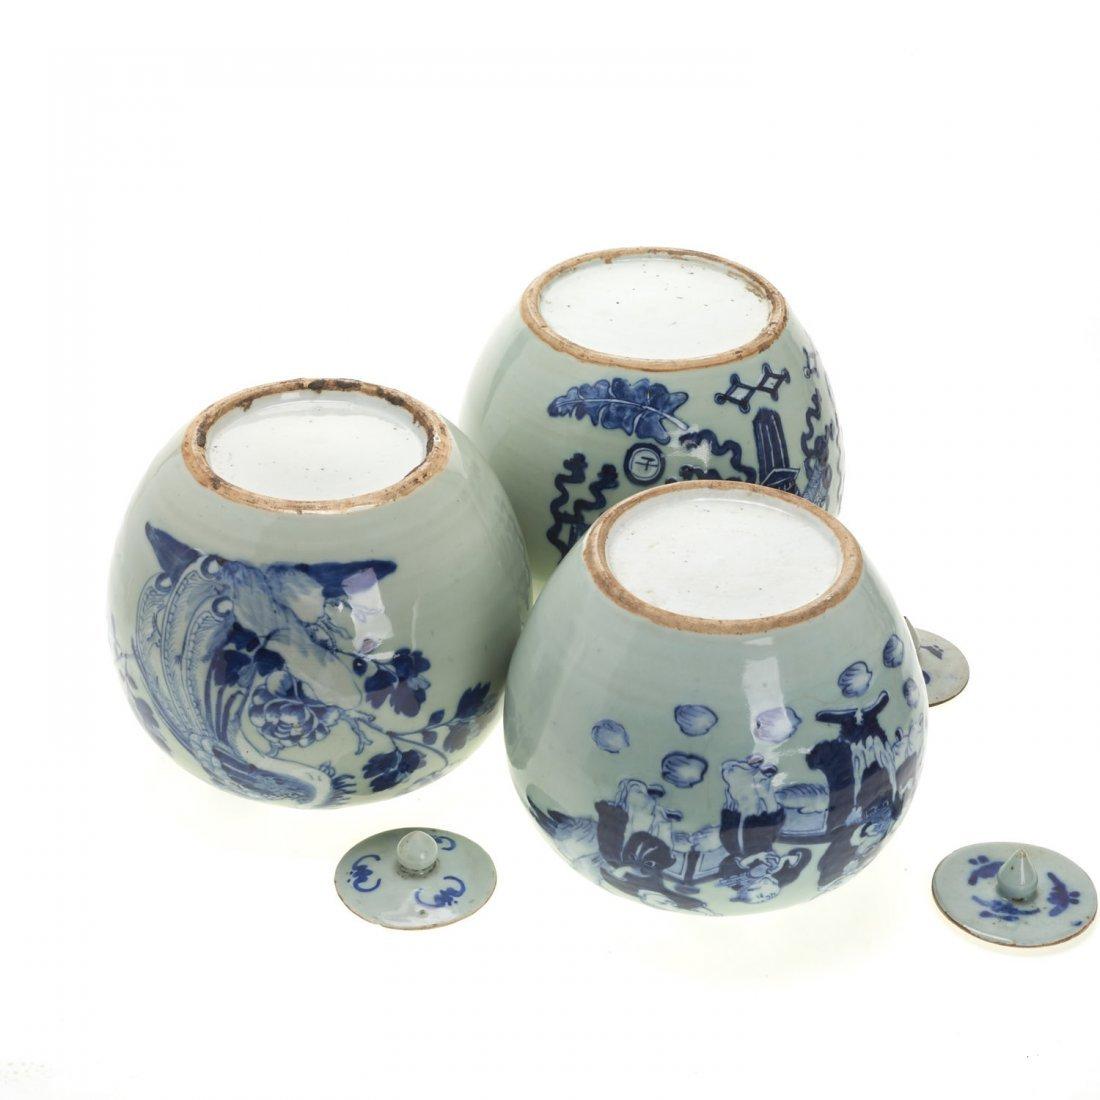 (3) Chinese blue and white globular covered jars - 7